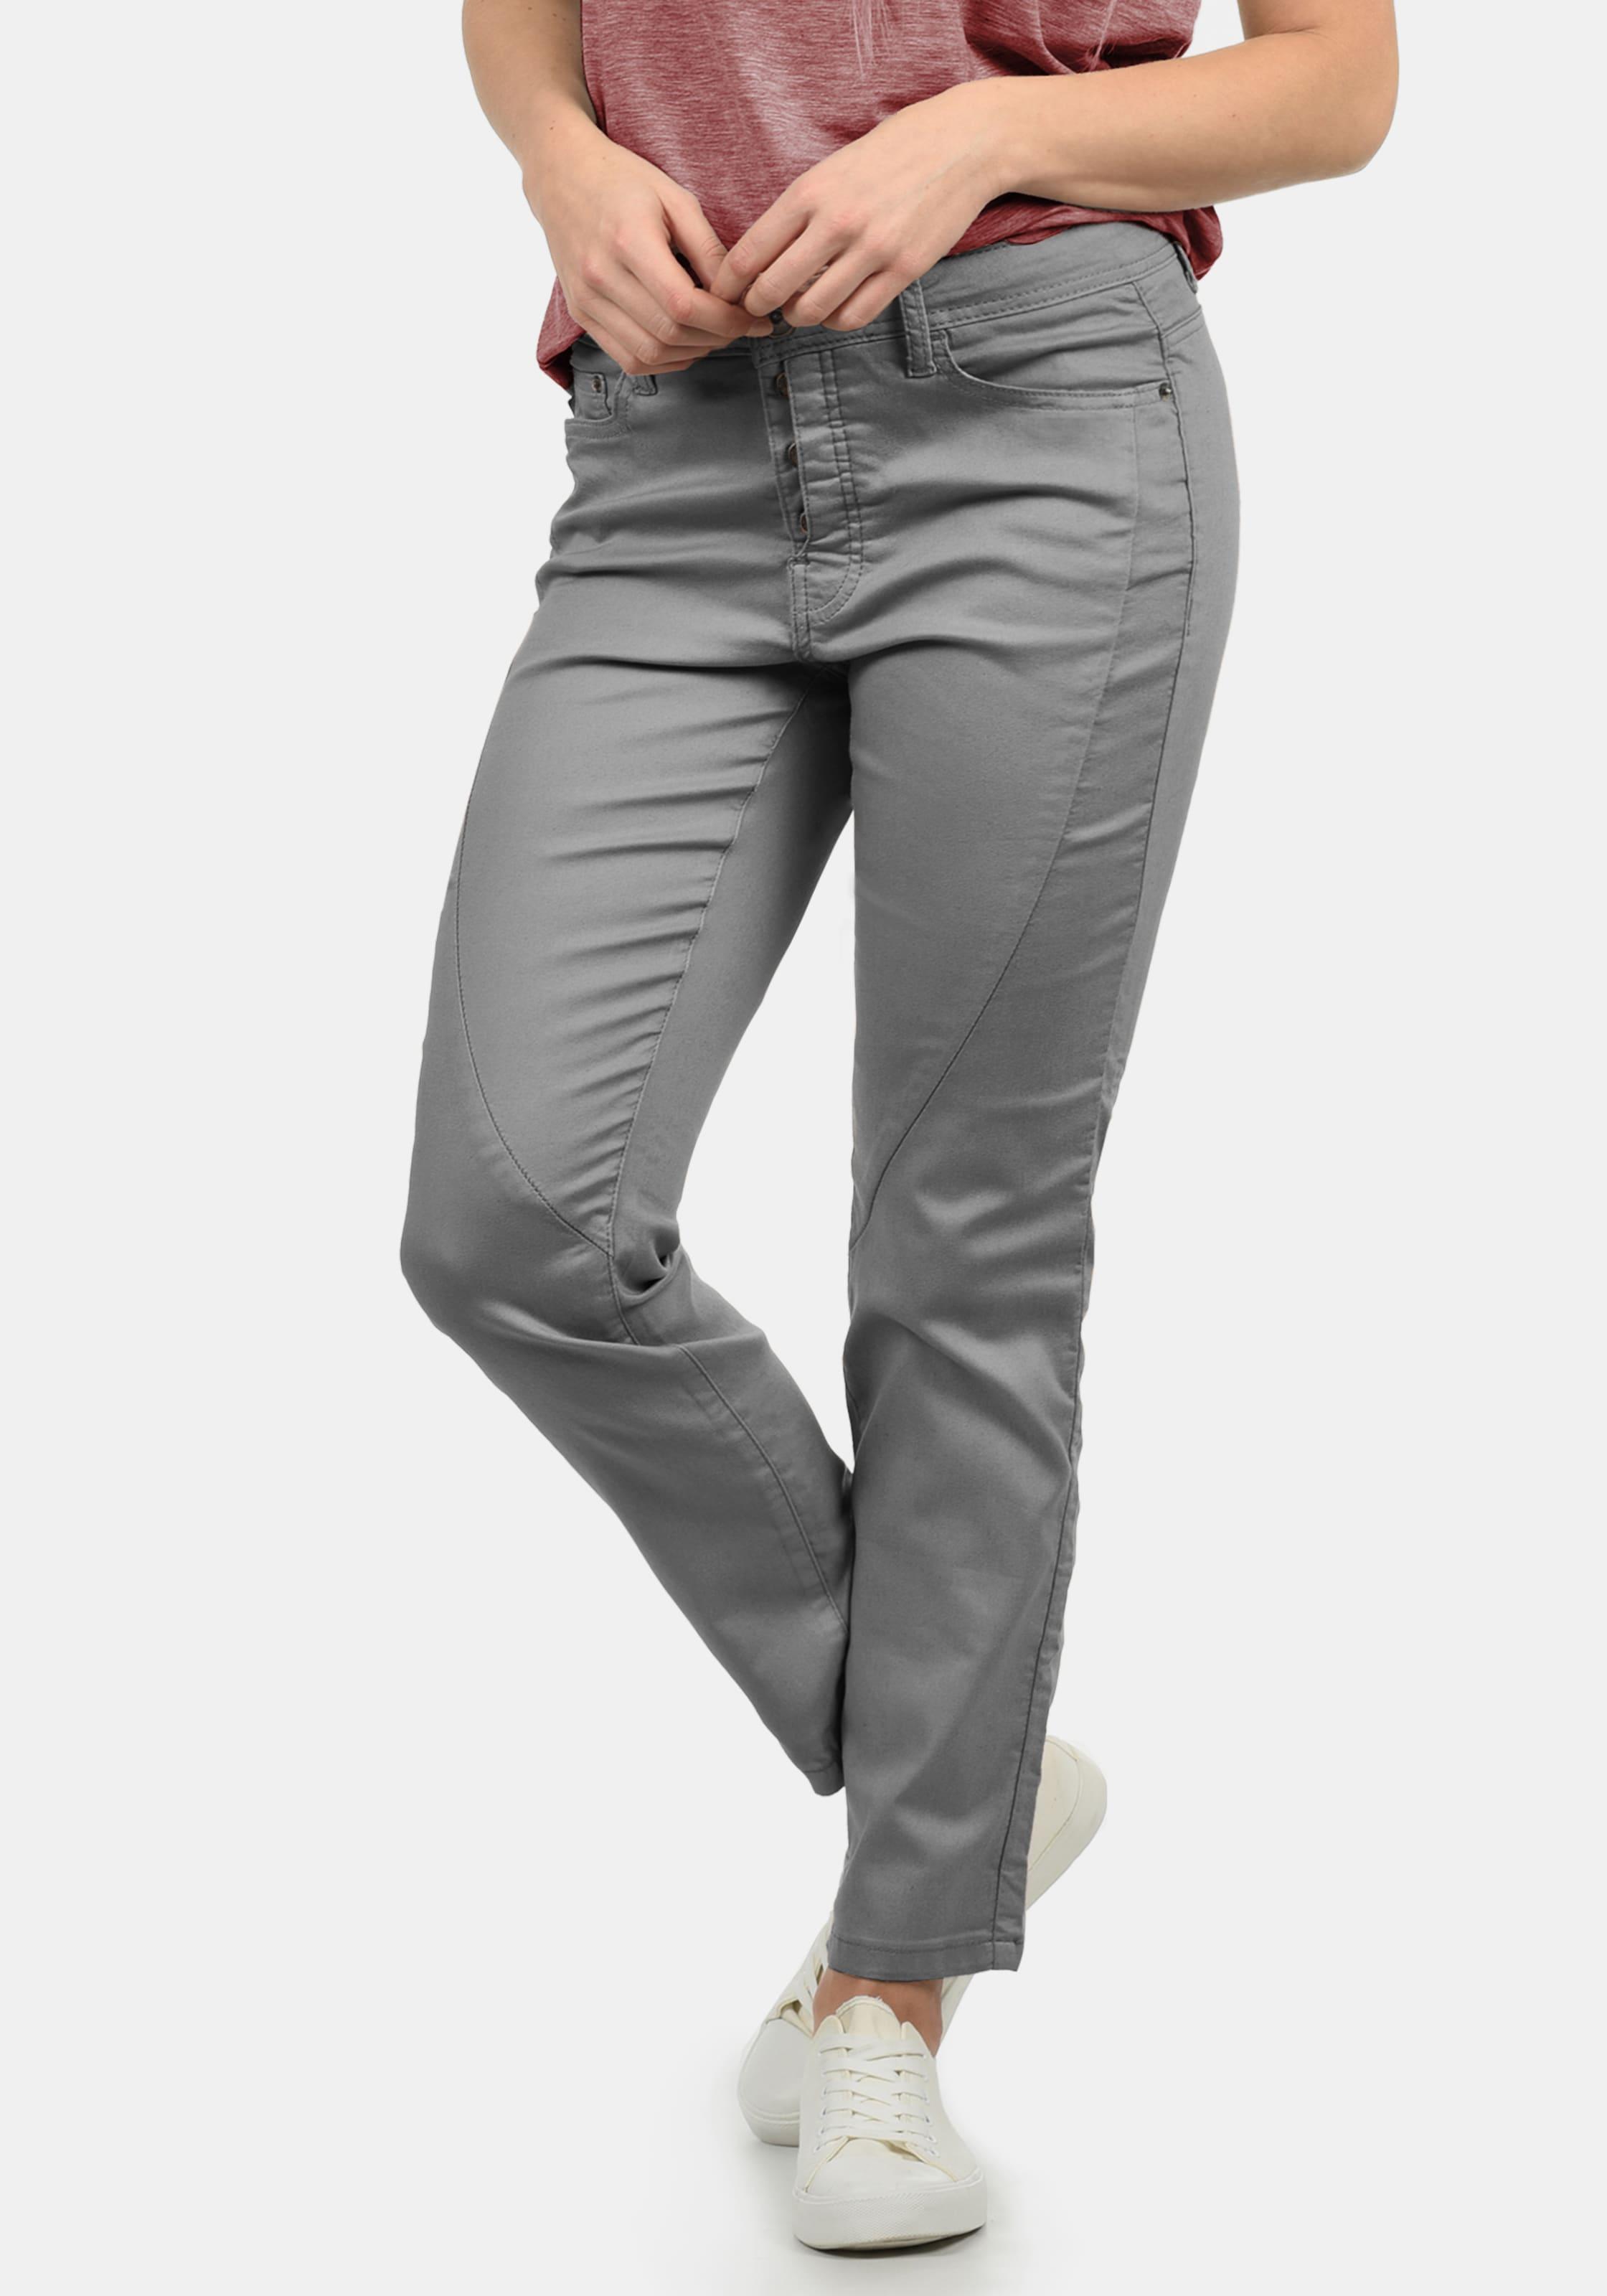 Desires Straight Grau In 'elbja' jeans c5S3AR4jLq